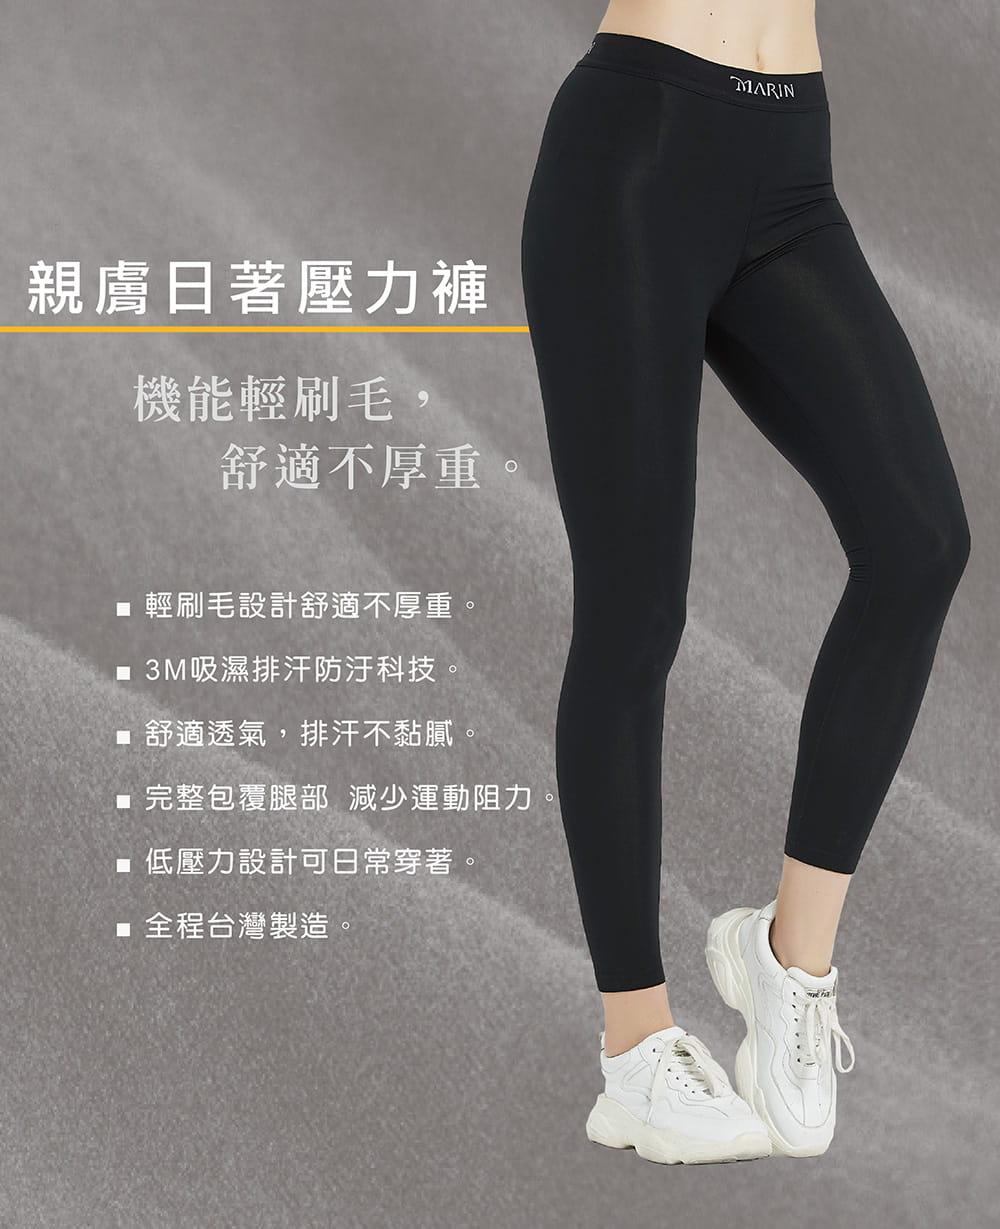 【MARIN】台灣製-親膚日著壓力褲 2